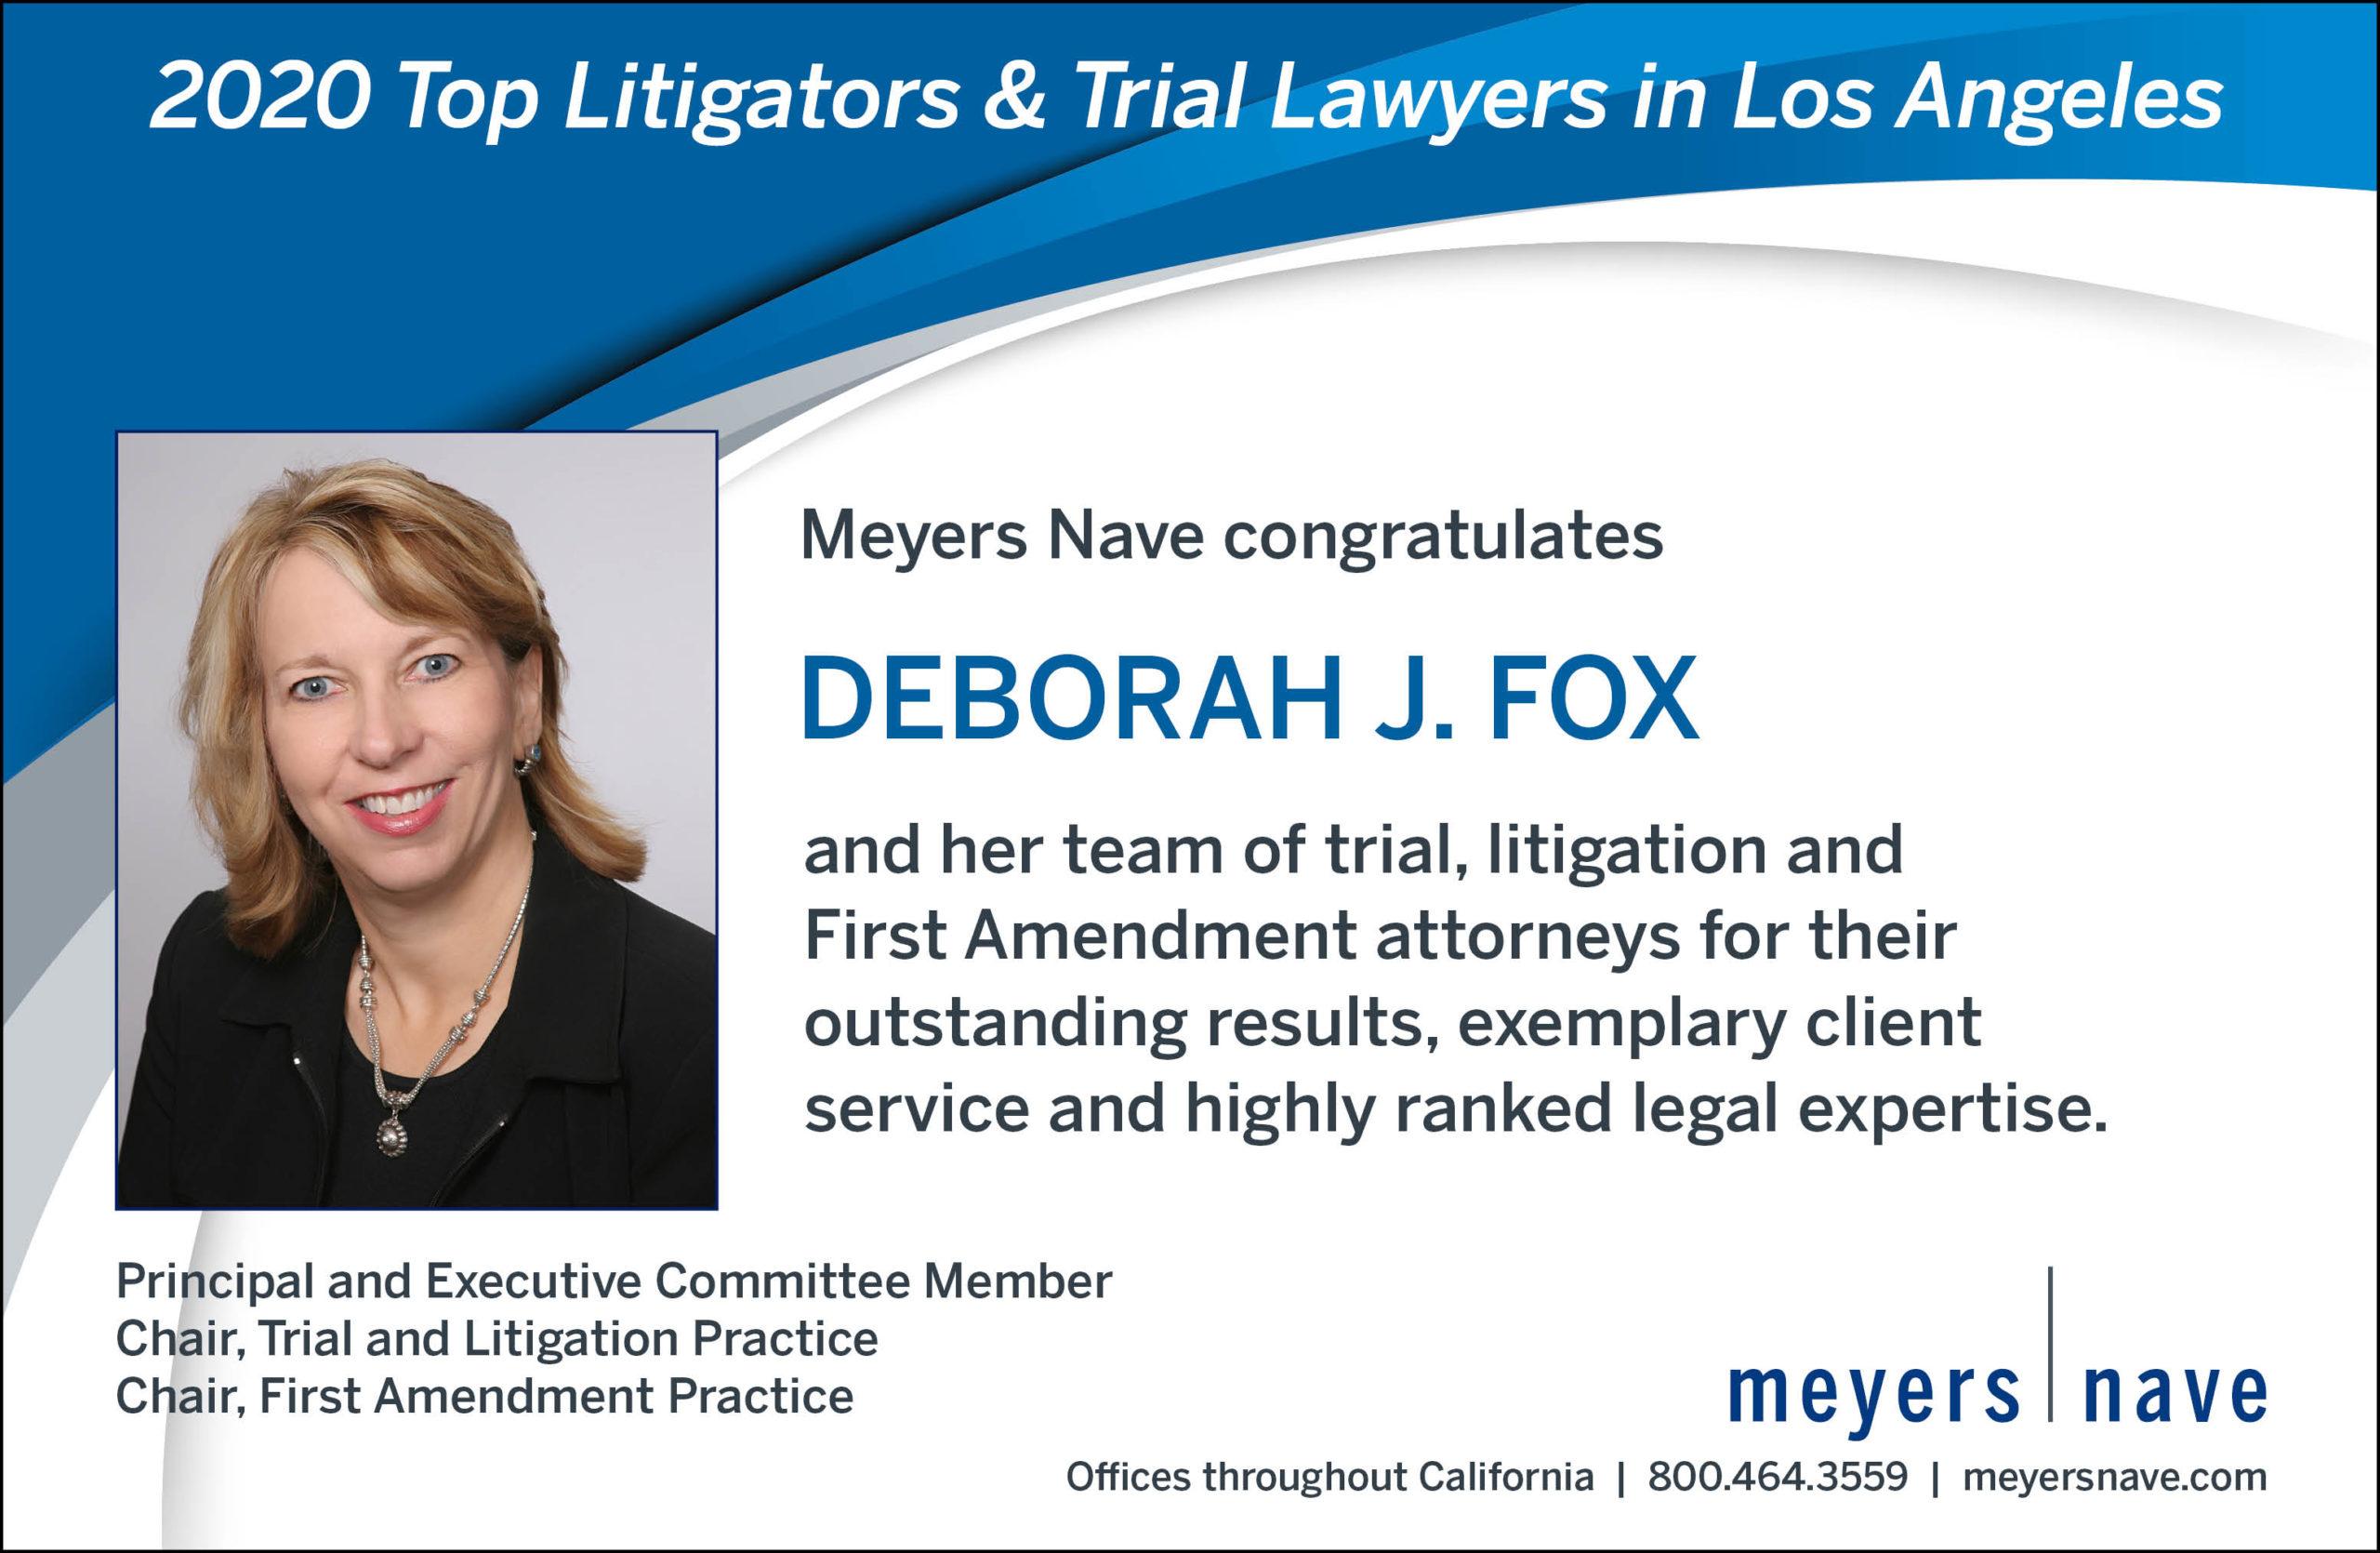 Deborah Fox Award Top Litigators and Trial Lawyers 2020